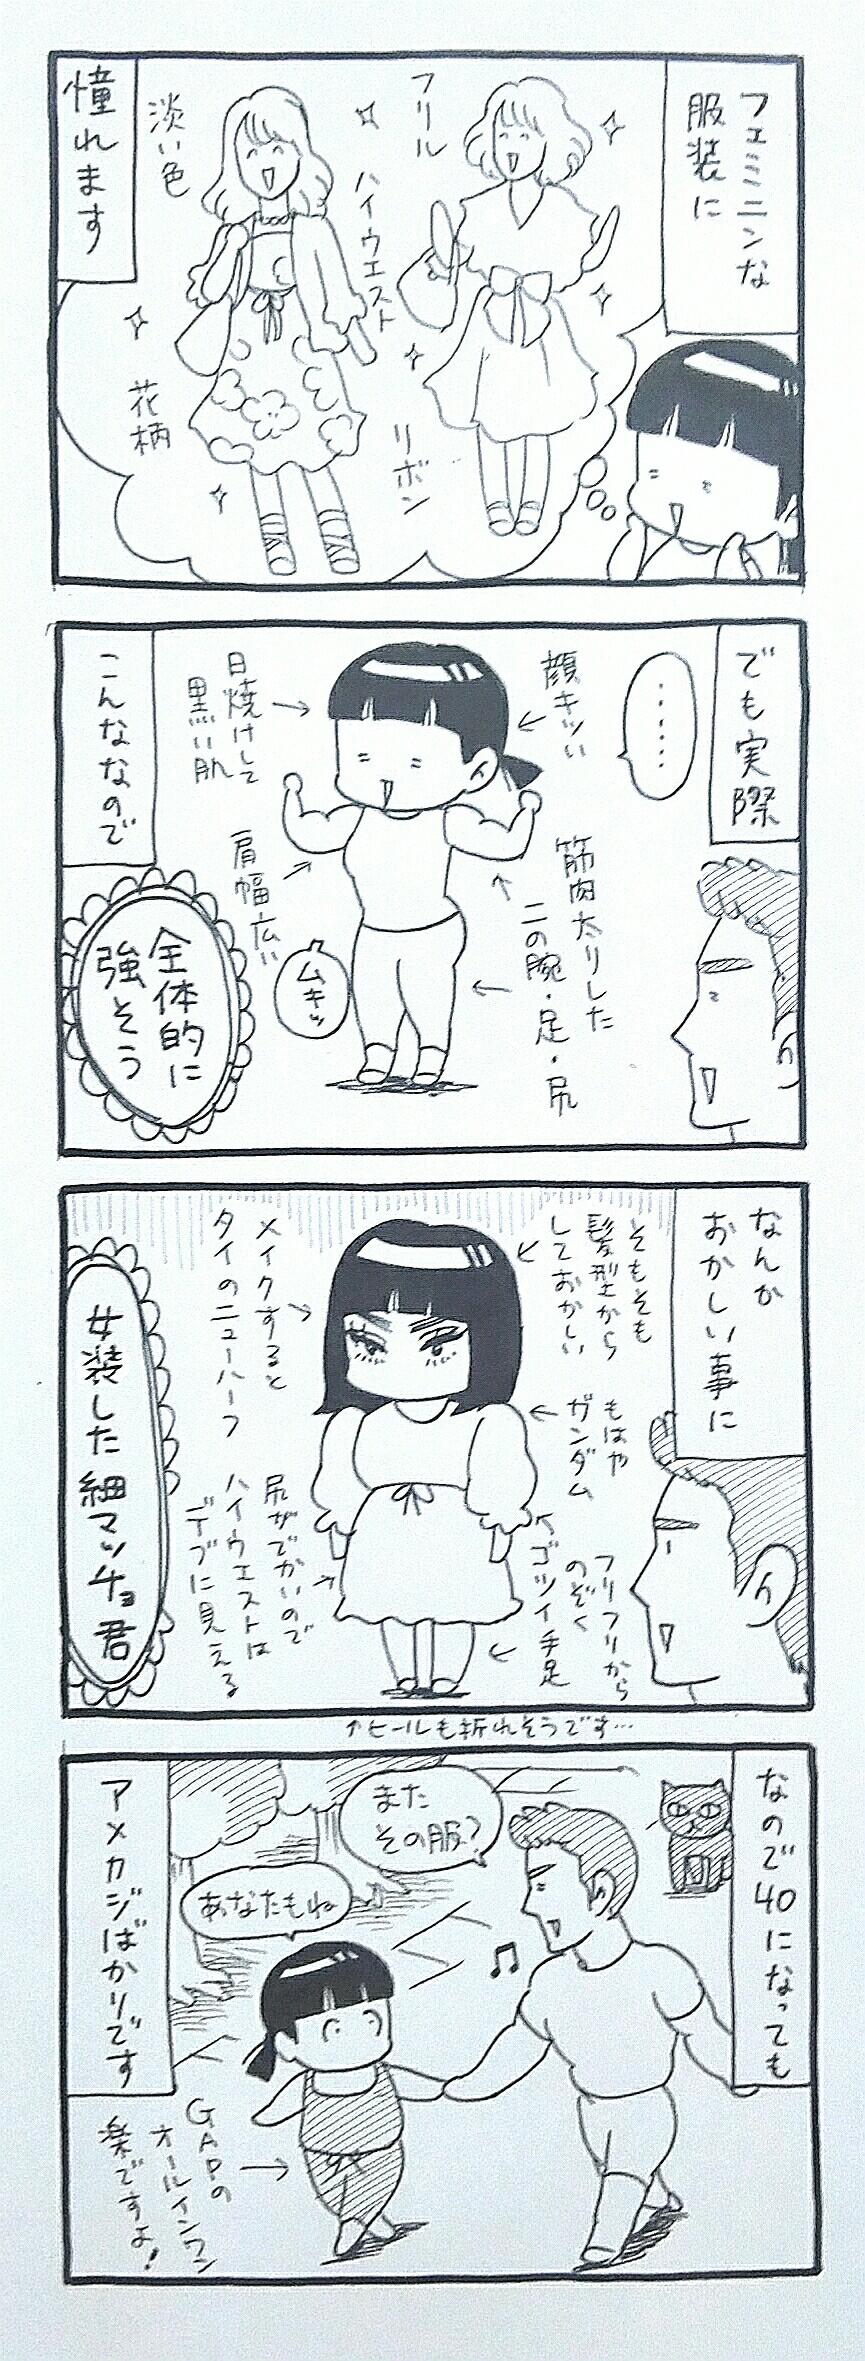 f:id:Shoko_drawing:20190611225152j:plain